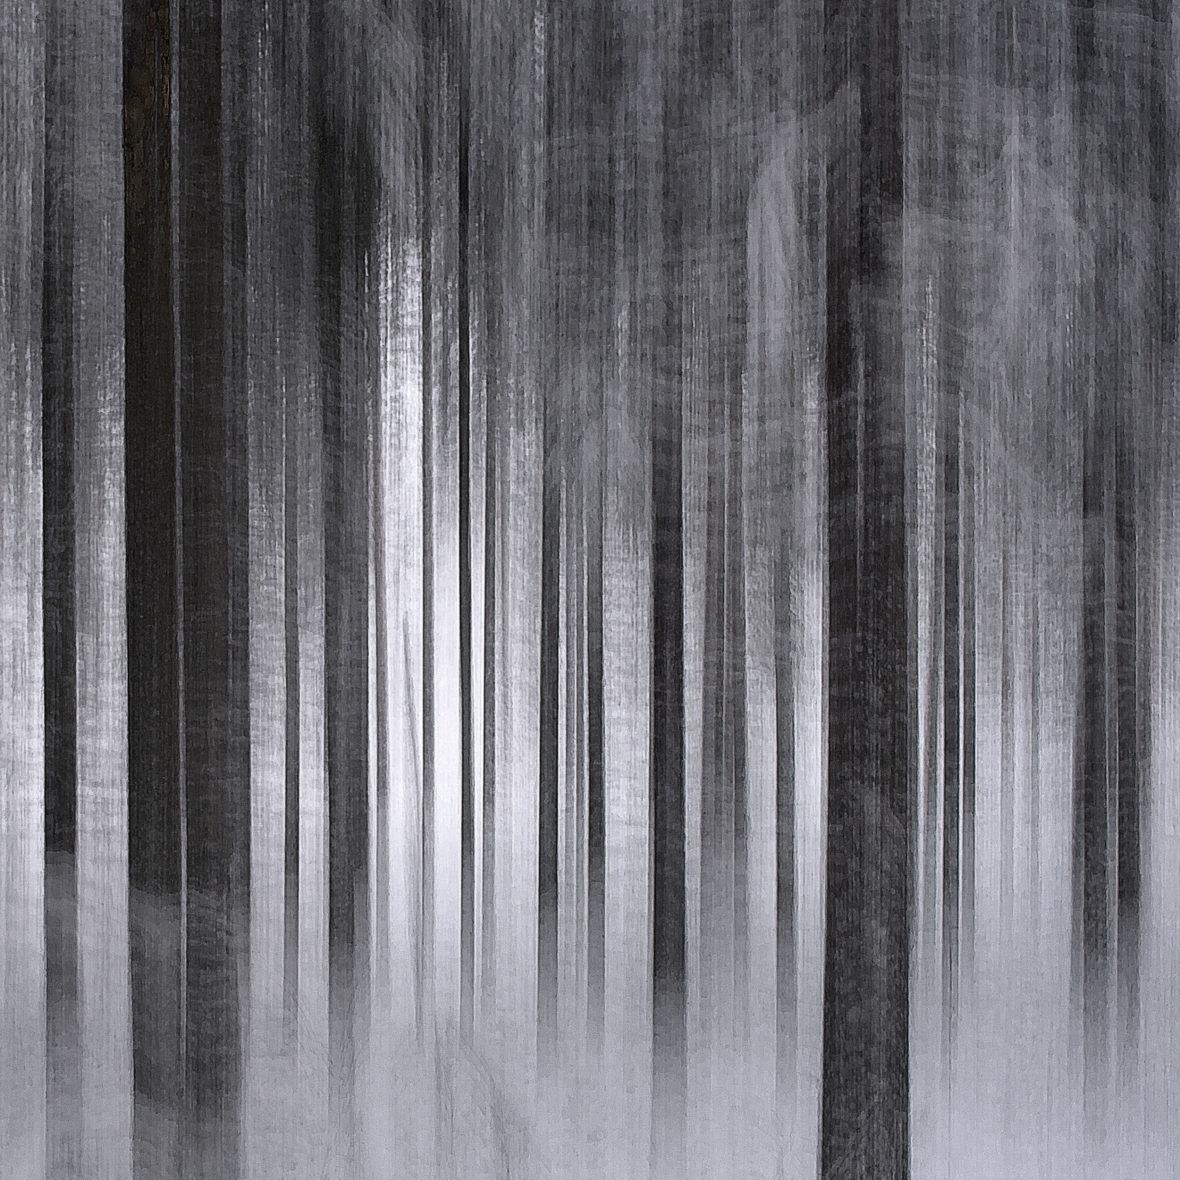 Metsä nukkuu / Sleeping Forest